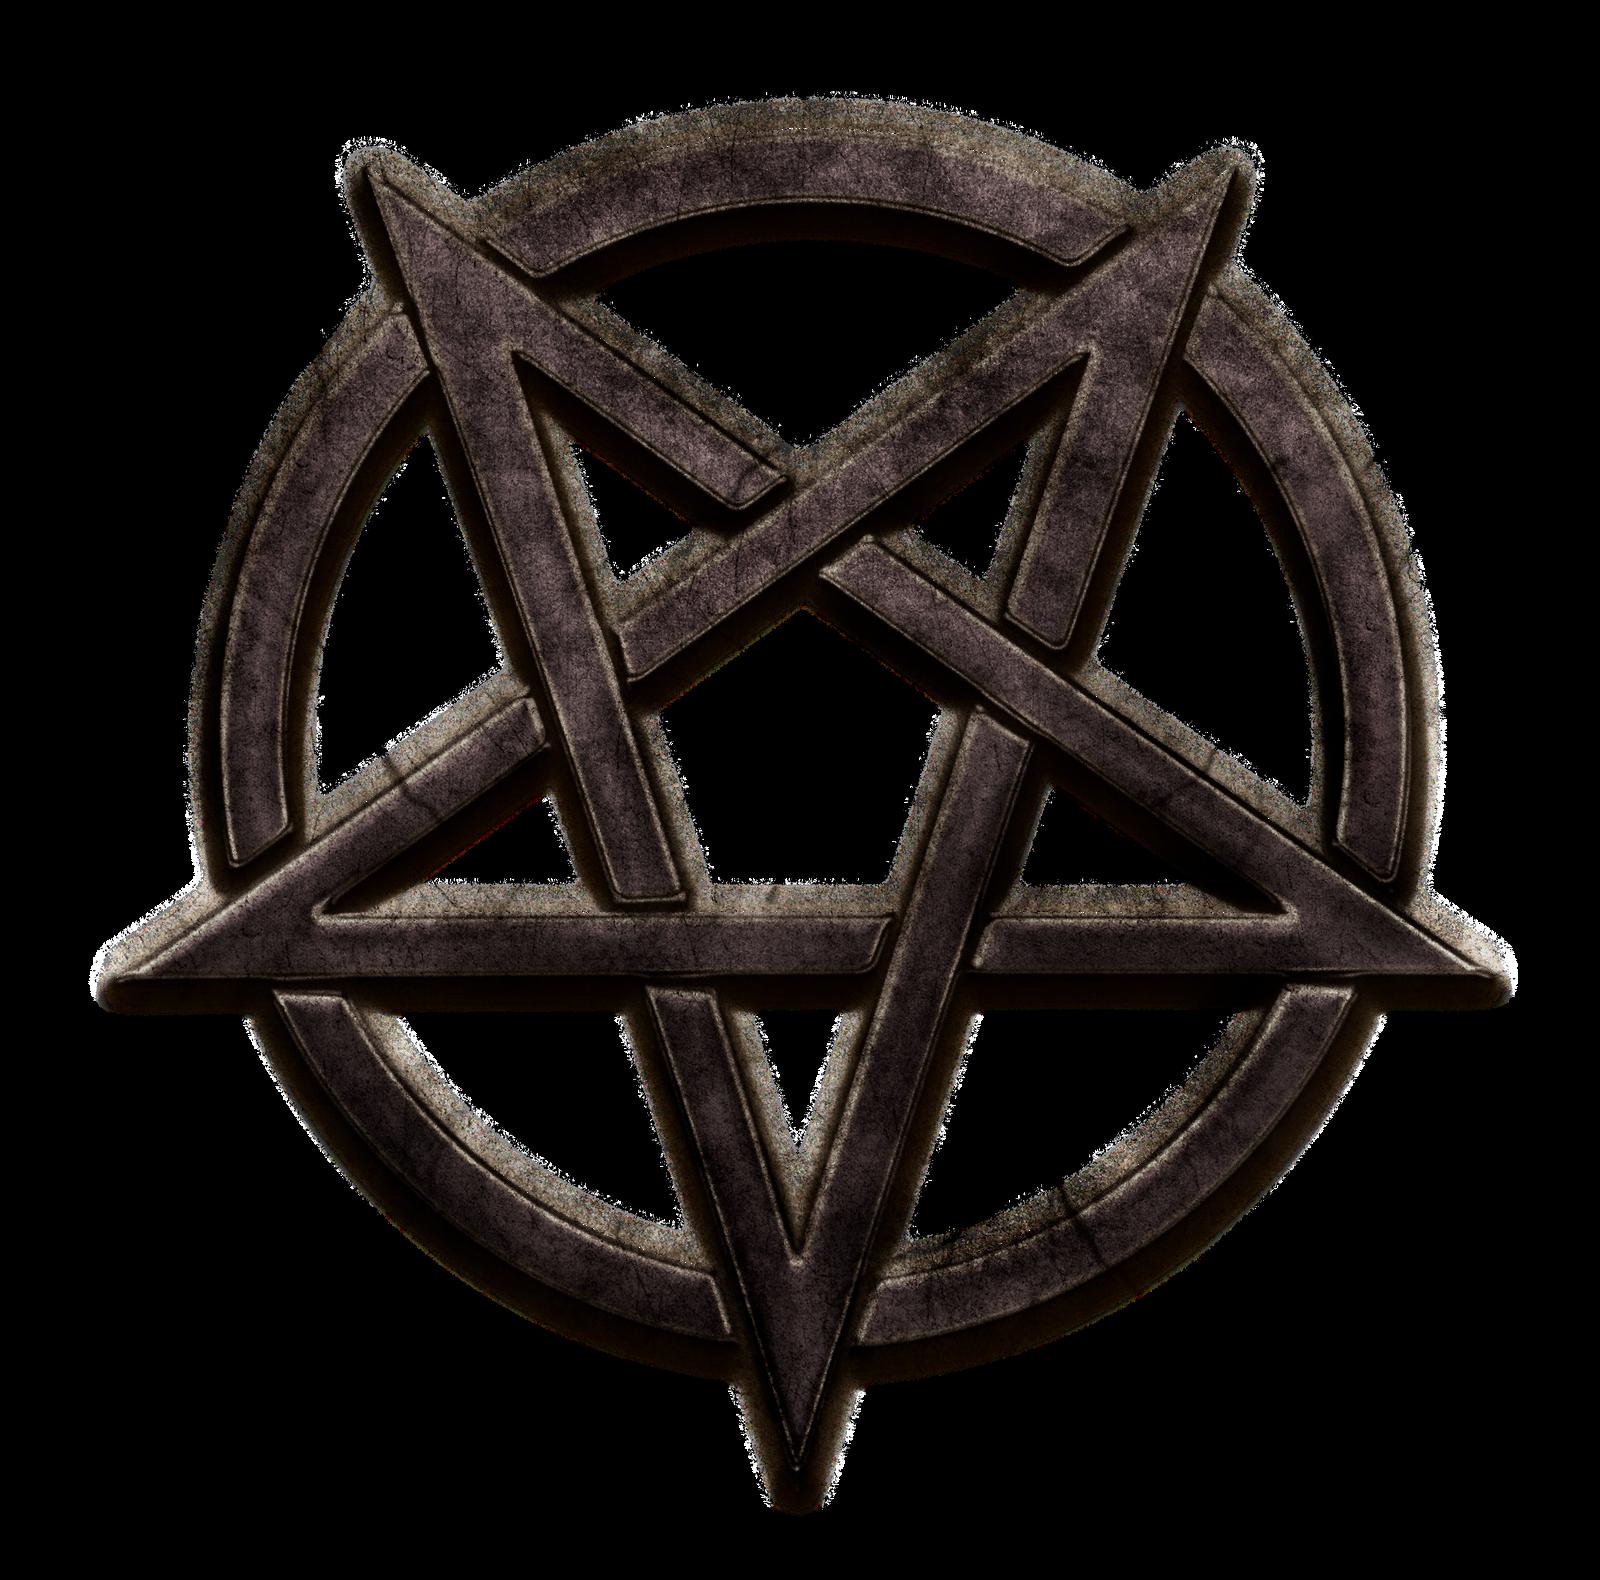 Metallic Pentagram Clipart By Vacaliga On Deviantart